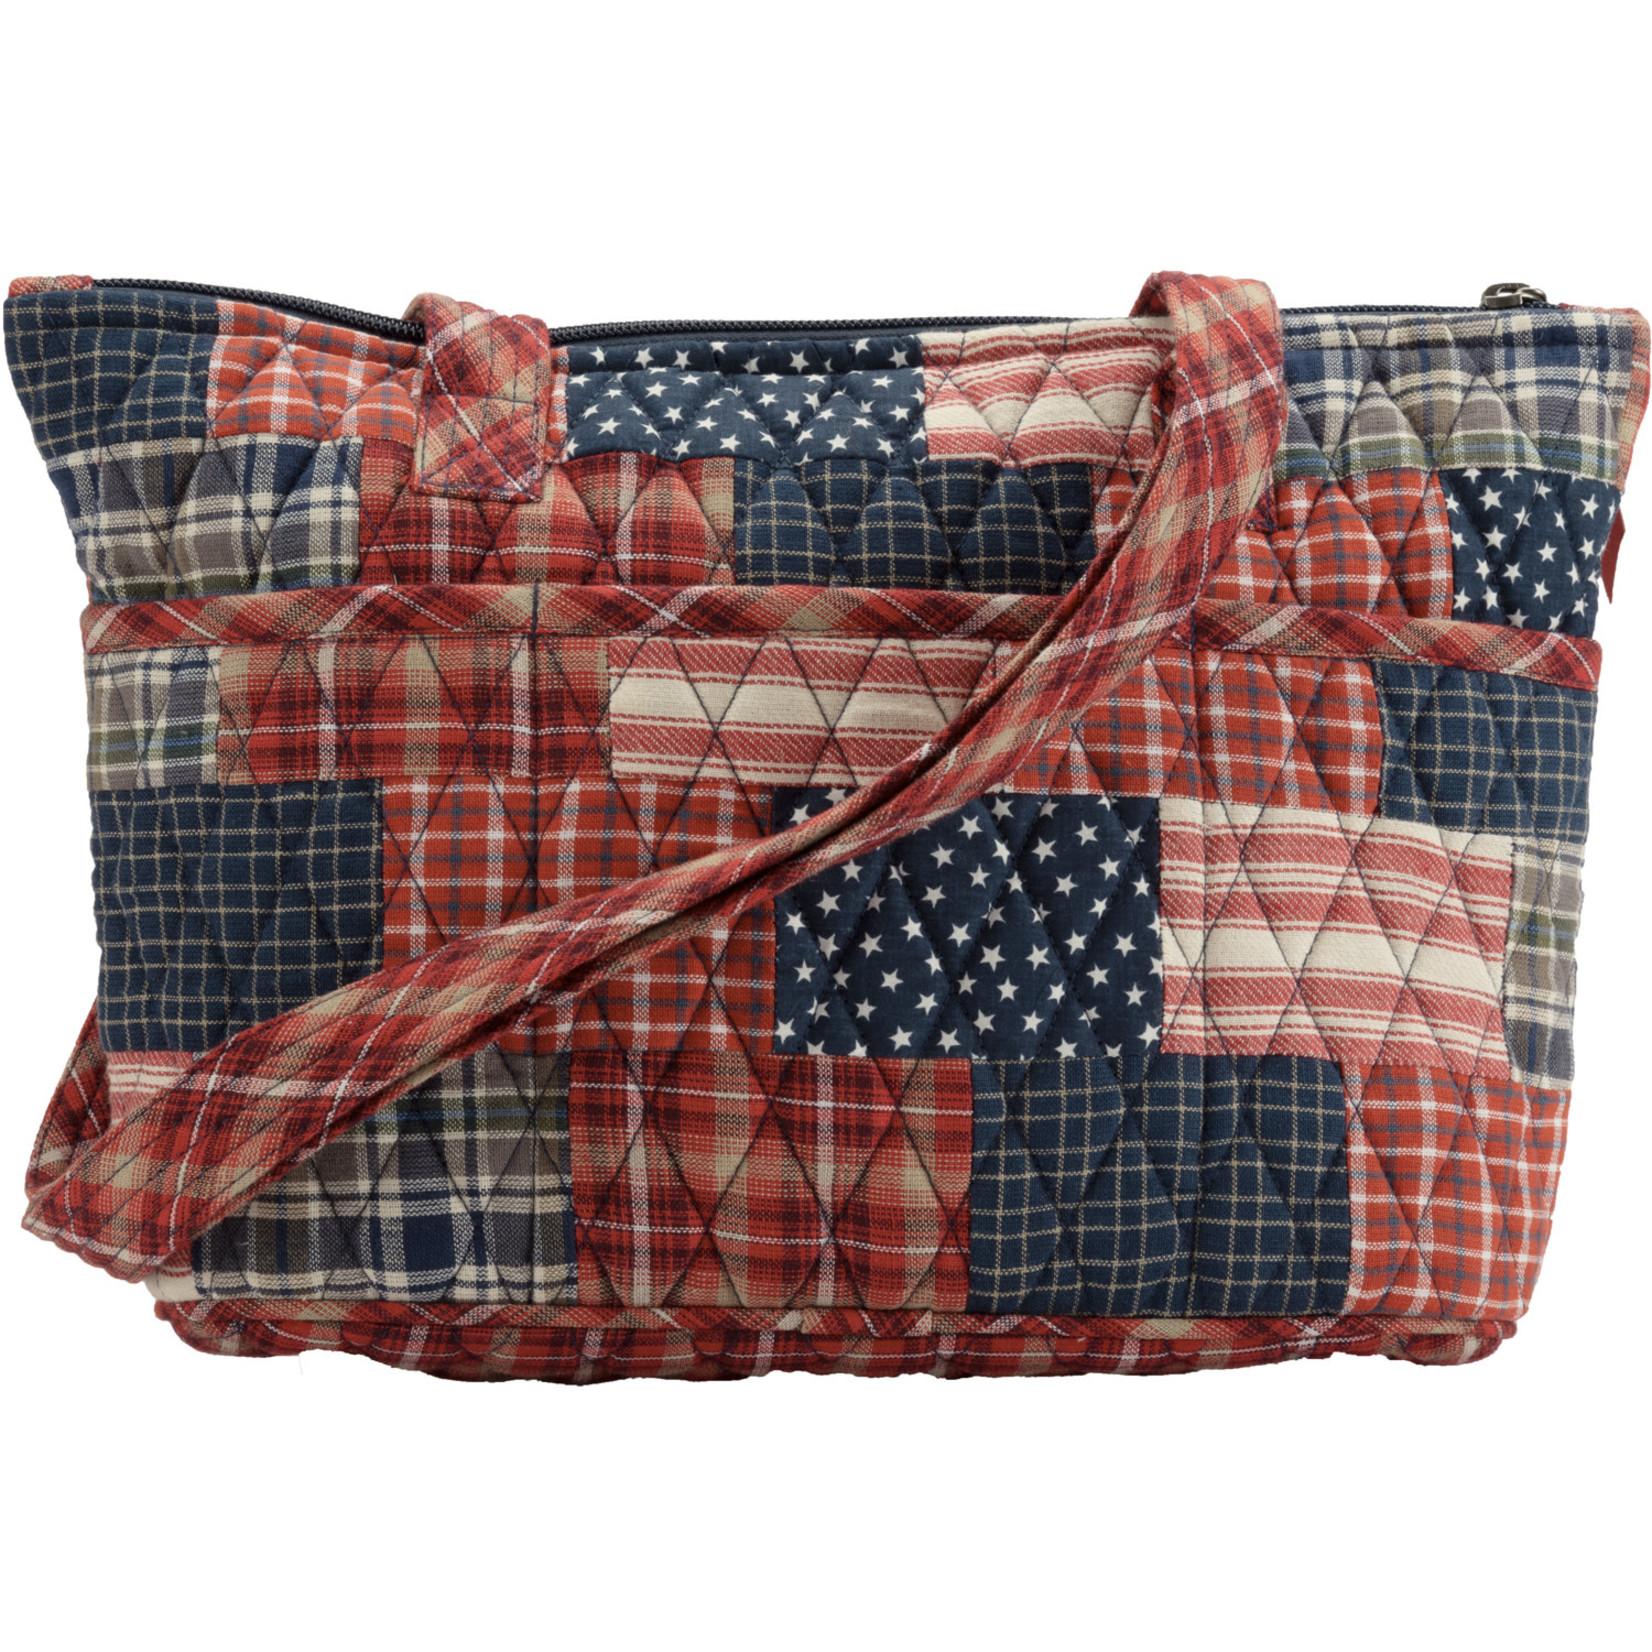 Bella Taylor Revere - Taylor handbag